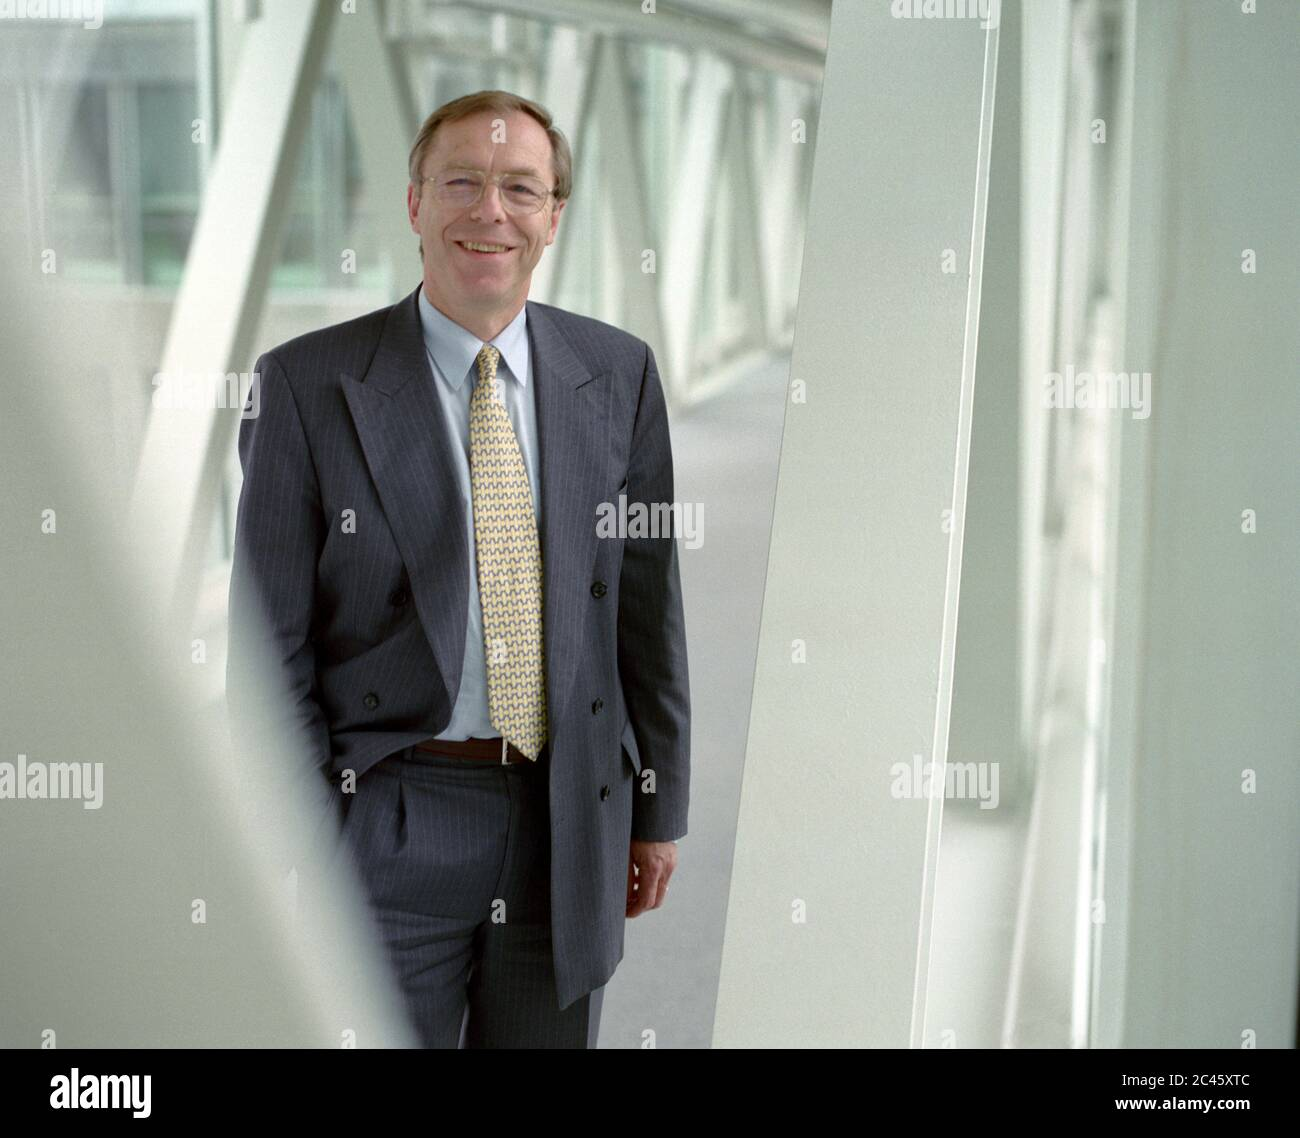 Walter Lechner - Board member of the Bavarian Insurance Chamber Stock Photo